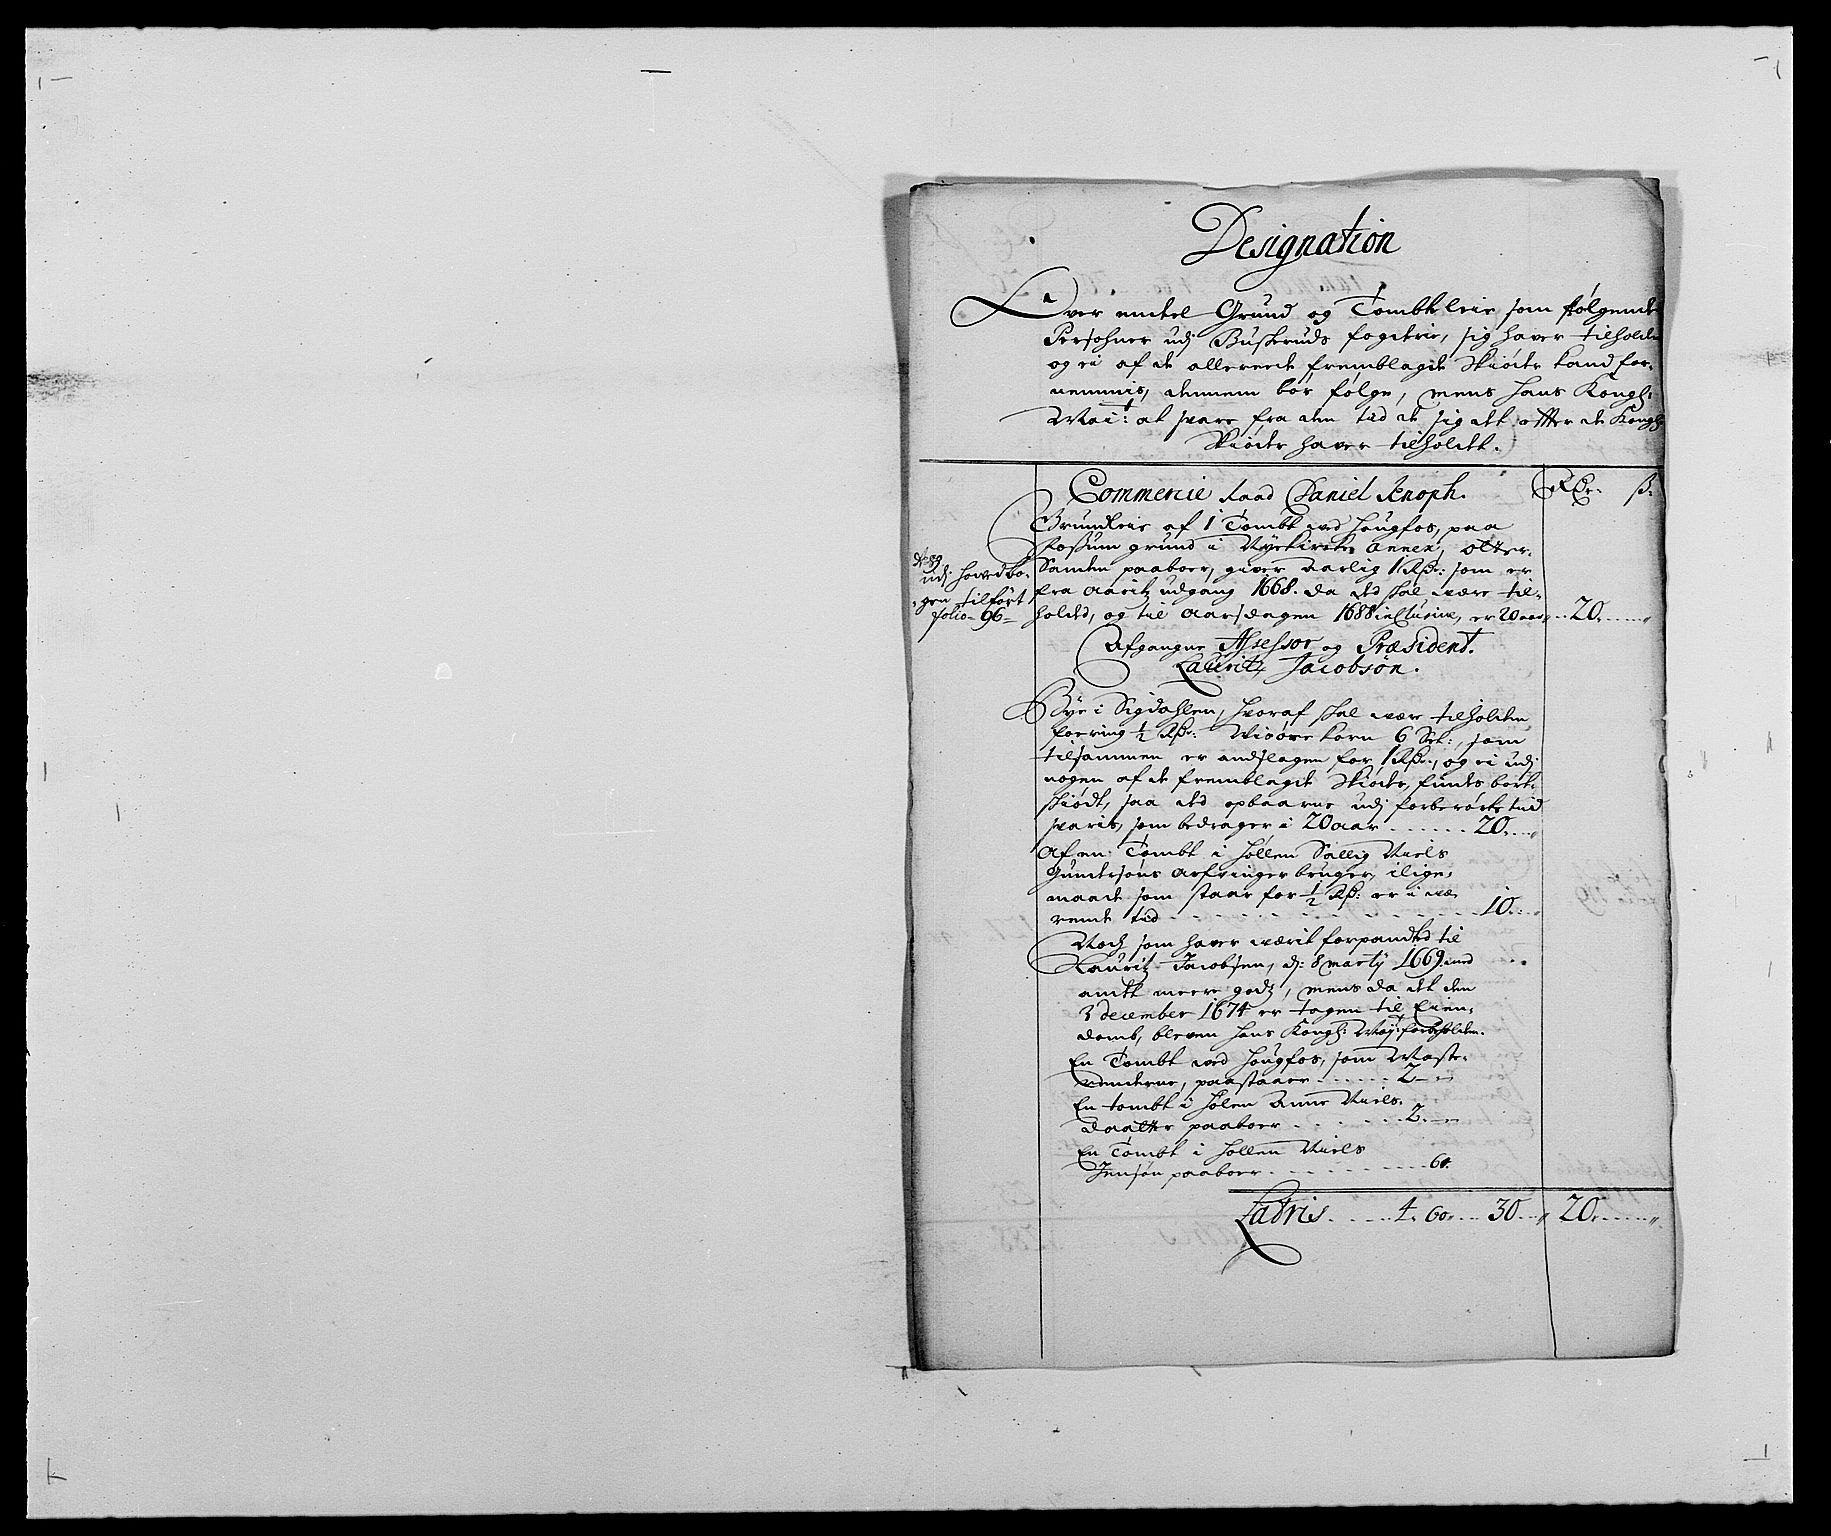 RA, Rentekammeret inntil 1814, Reviderte regnskaper, Fogderegnskap, R25/L1679: Fogderegnskap Buskerud, 1687-1688, s. 41